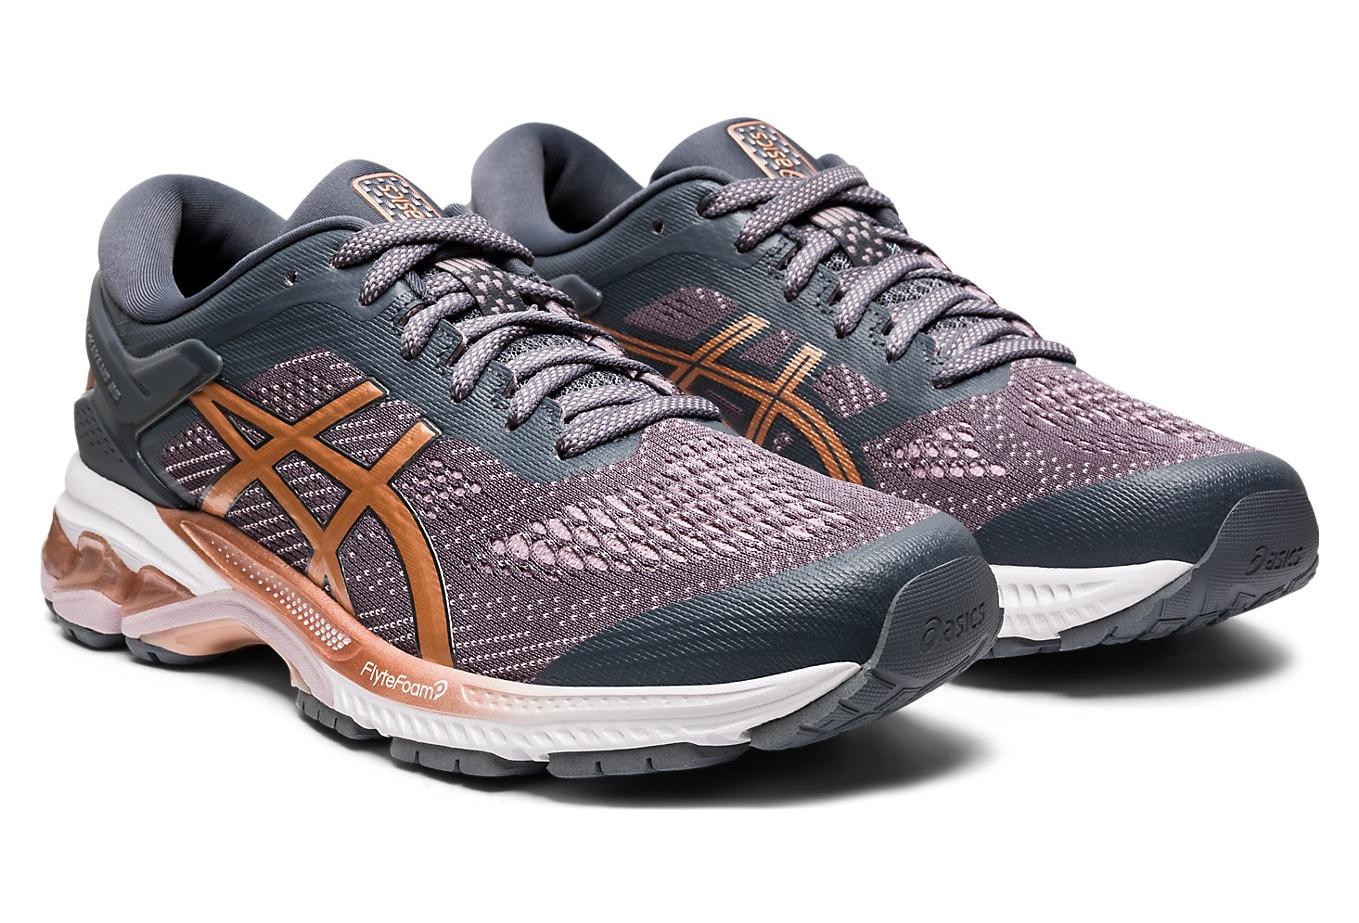 Asics-Gel-Kayano-26- +80 Most Inspiring Workout Shoes Ideas for Women